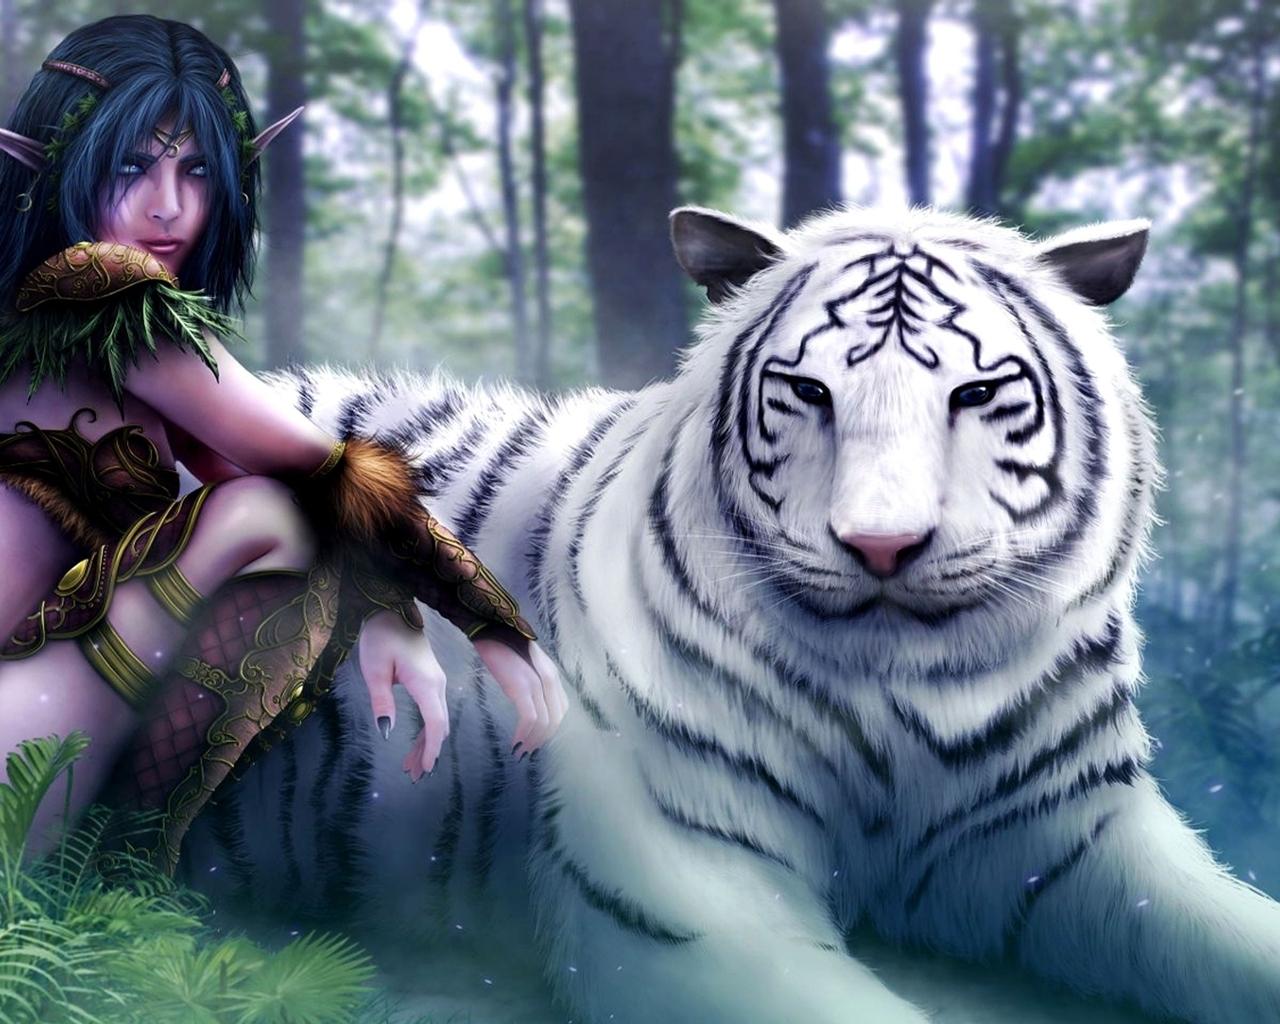 World of warcraft white tiger fantasy art elves artwork drawings (1280x1024)